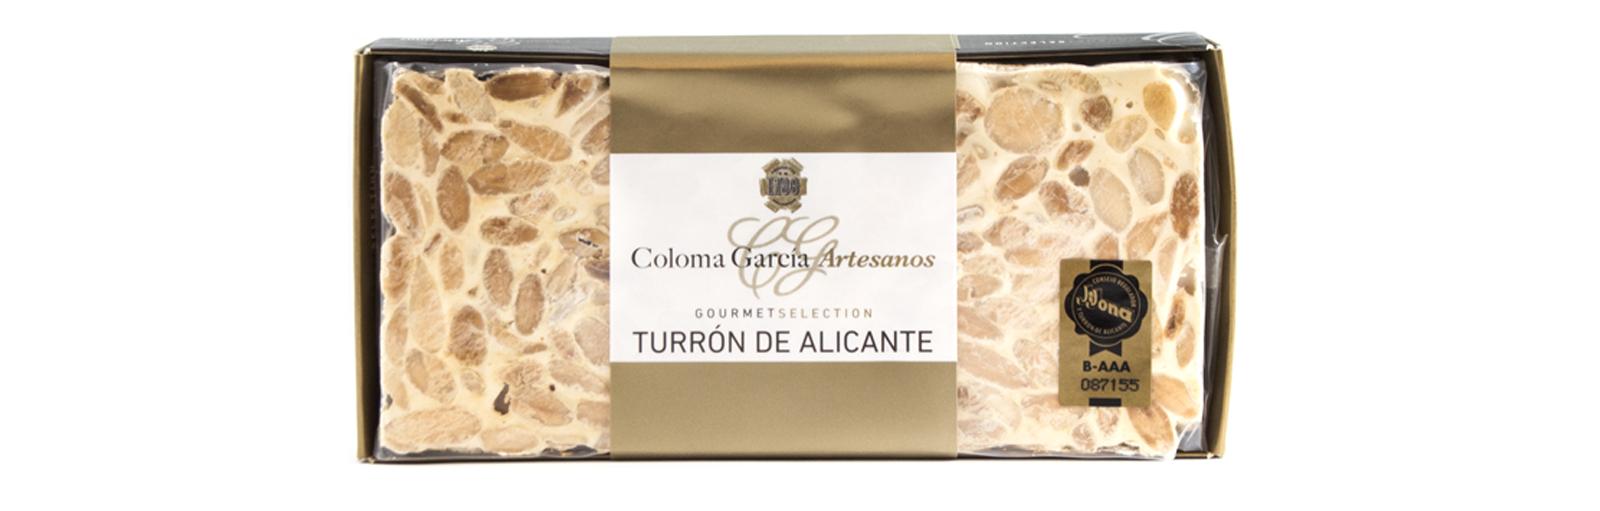 TURRÓN DE ALICANTE RILSAN GOURMET